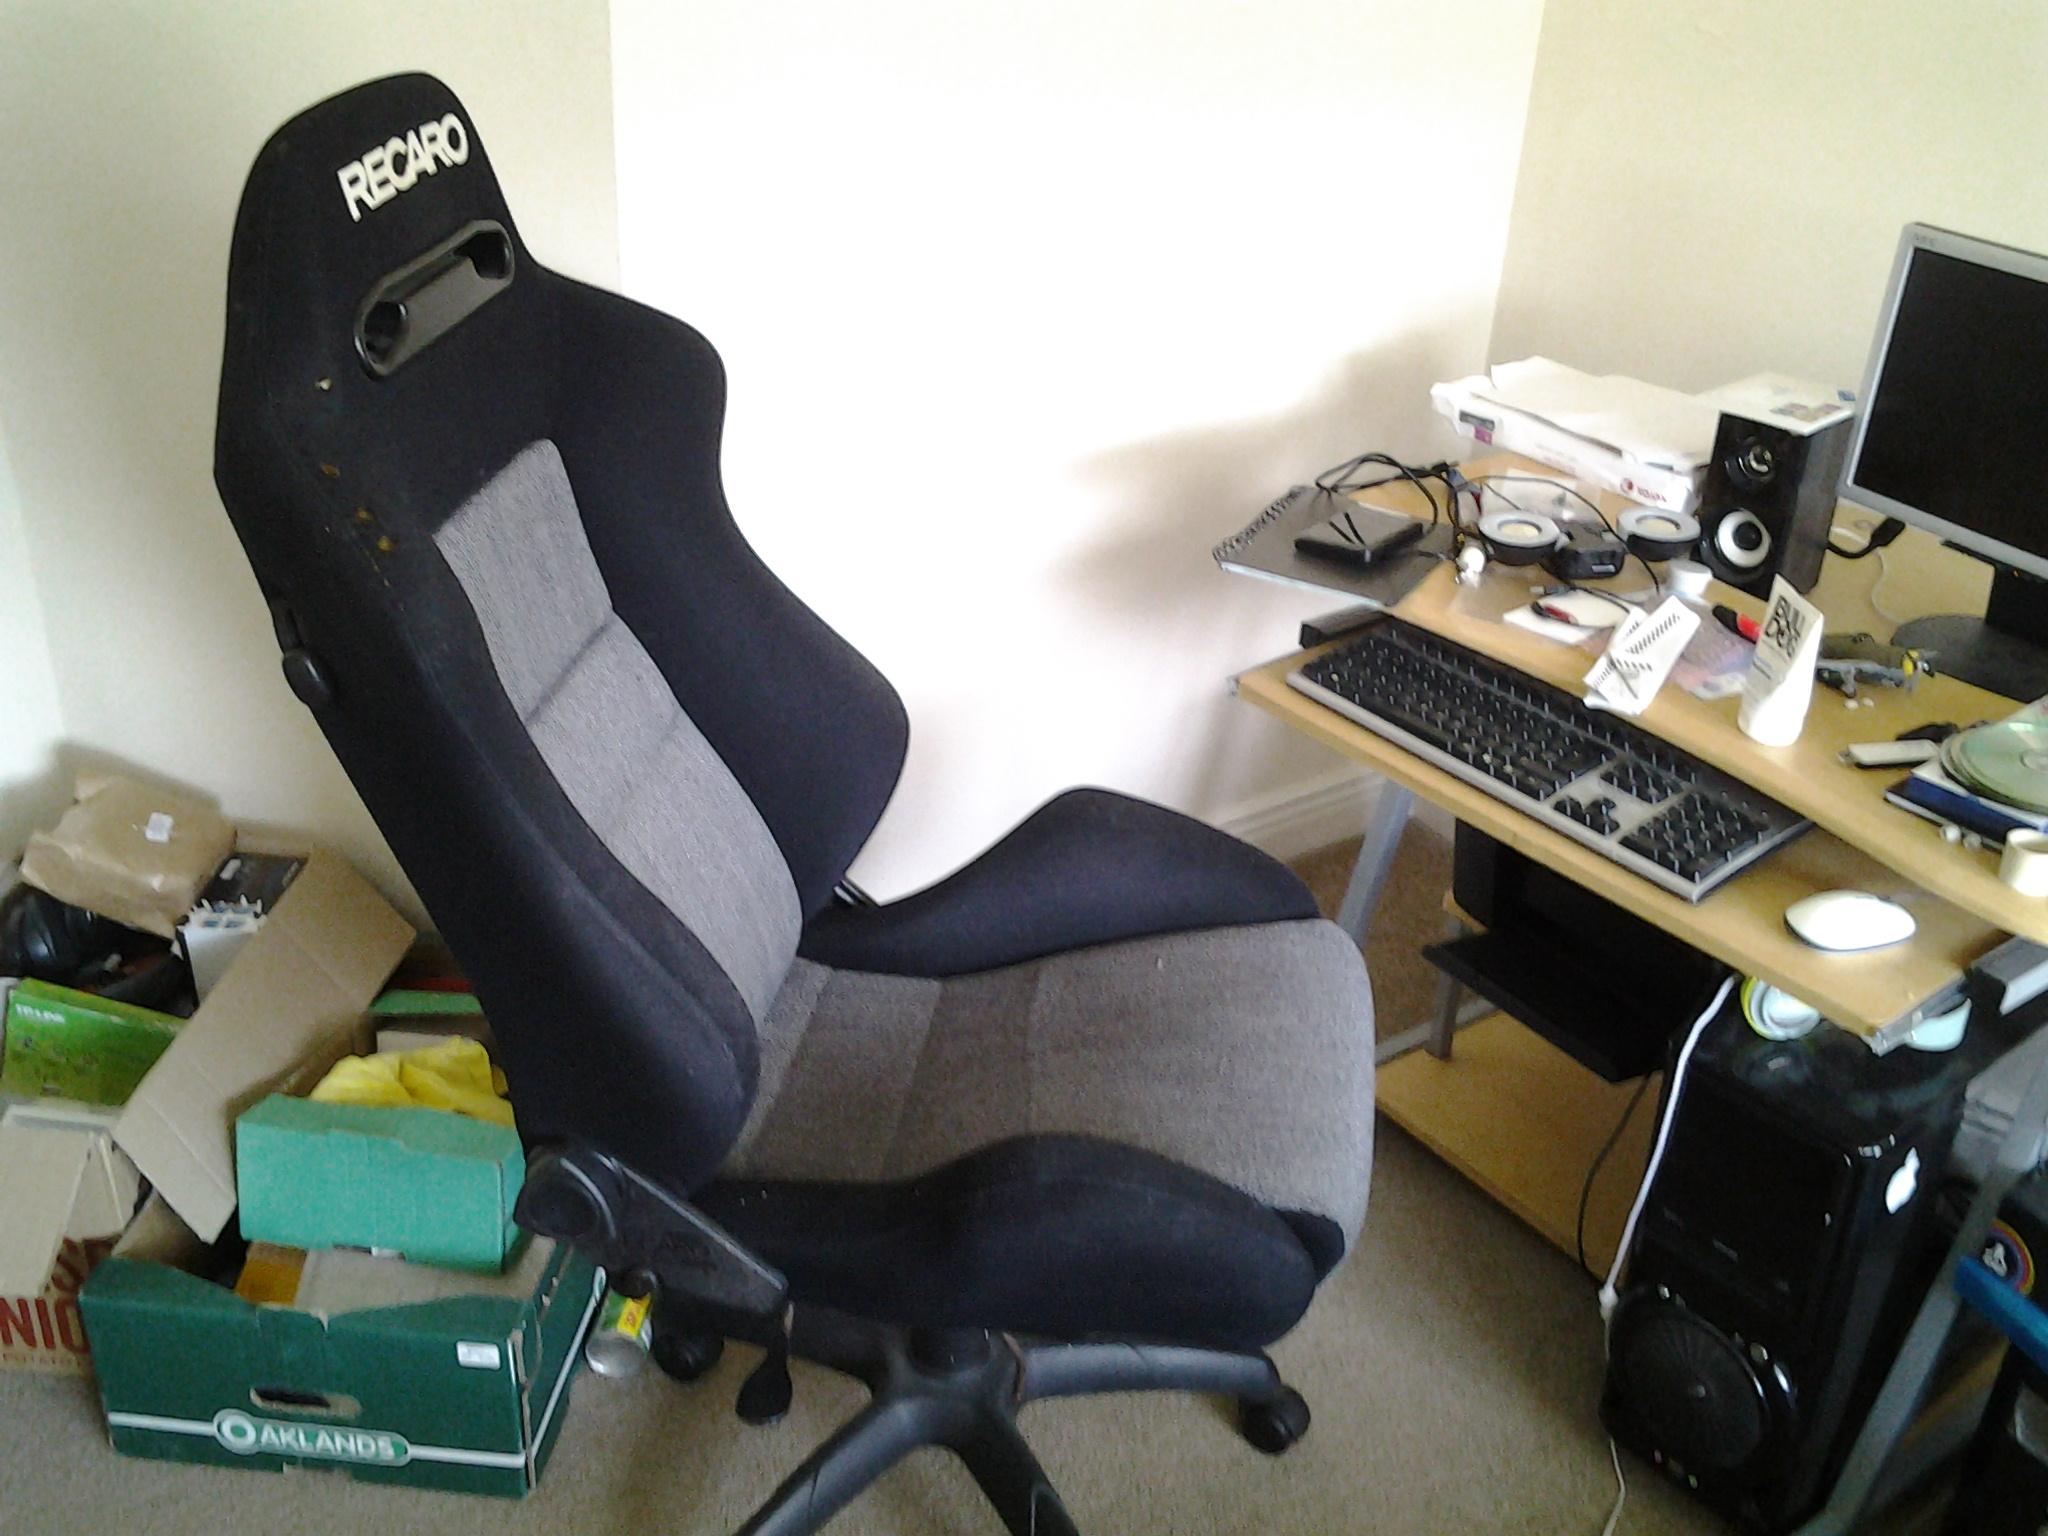 honda recaro seat office chair diy vid 20120903_151954jpg honda recaro seat office